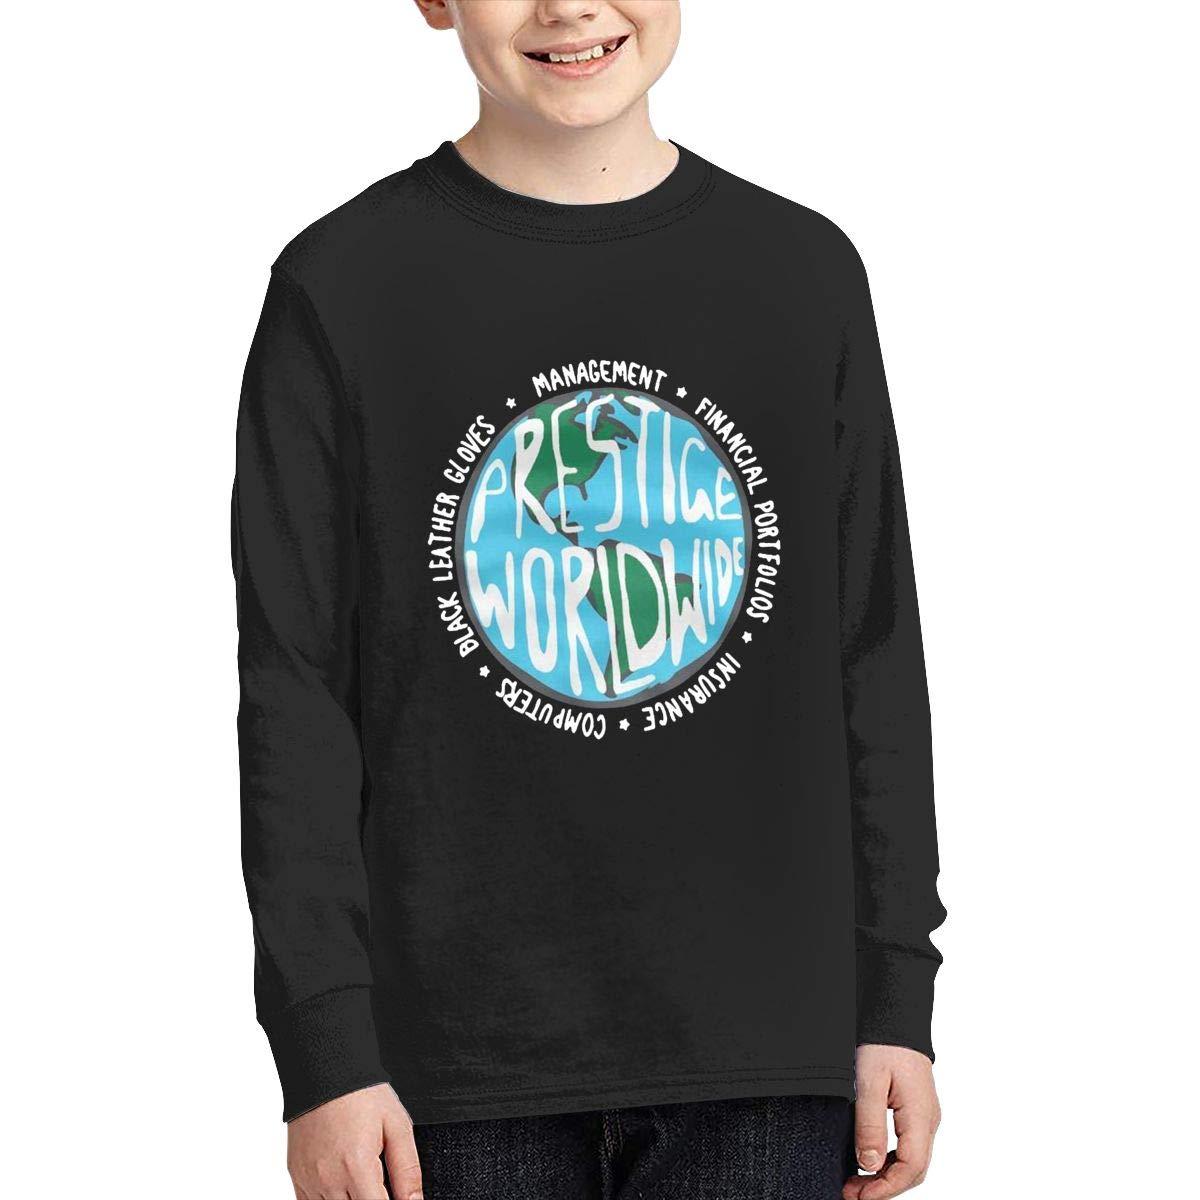 Onlybabycare Prestige Worldwide Big Boys Moisture Pullover Sweatshirt Graphic Shirt